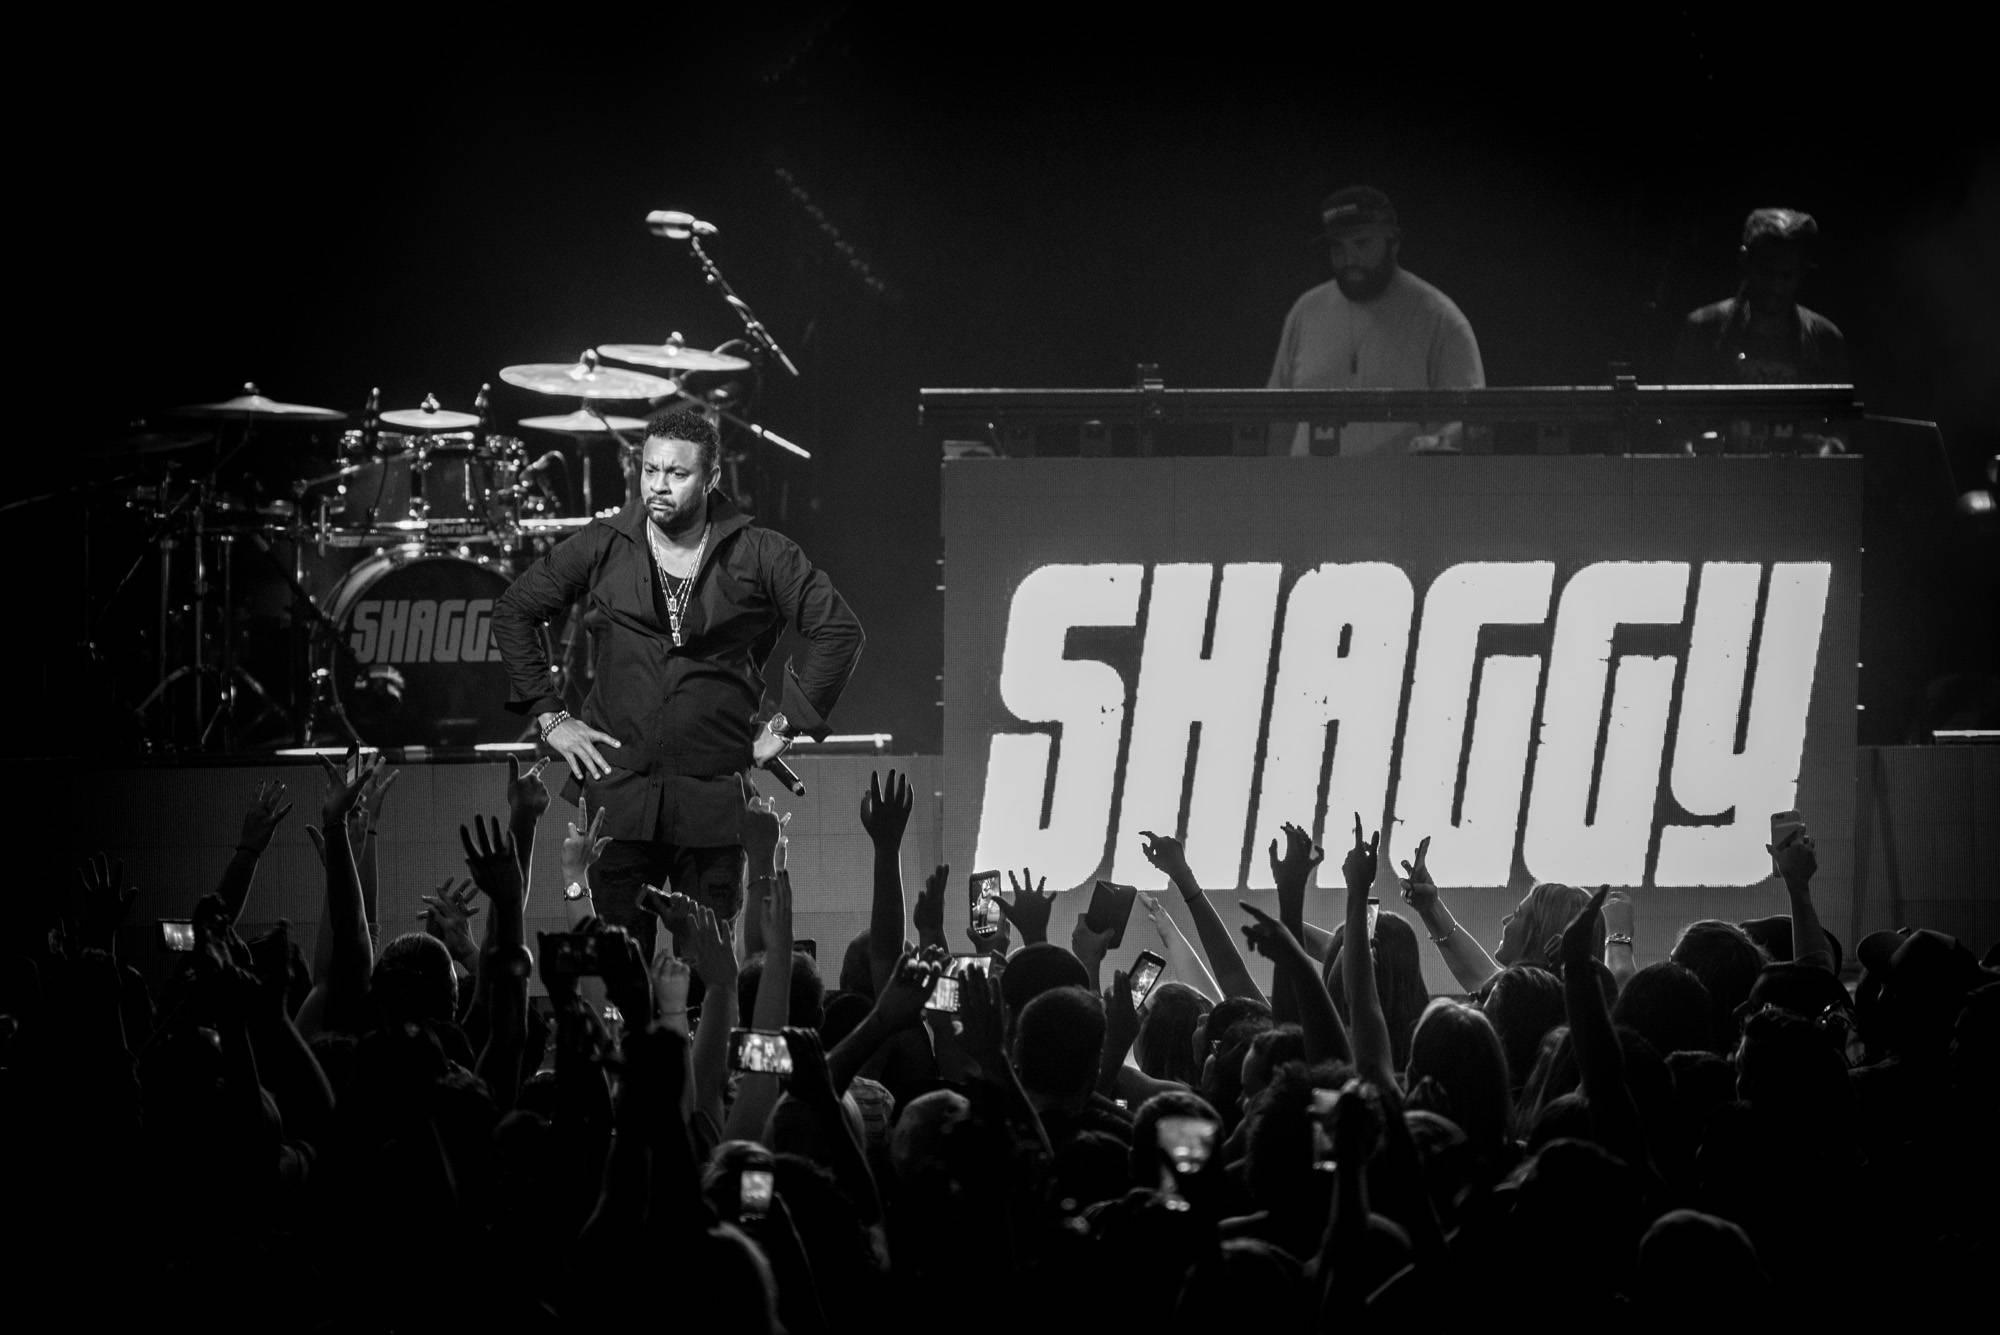 Shaggy at the Commodore Ballroom, Vancouver, Sept 15 2017. Jason Martin photo.